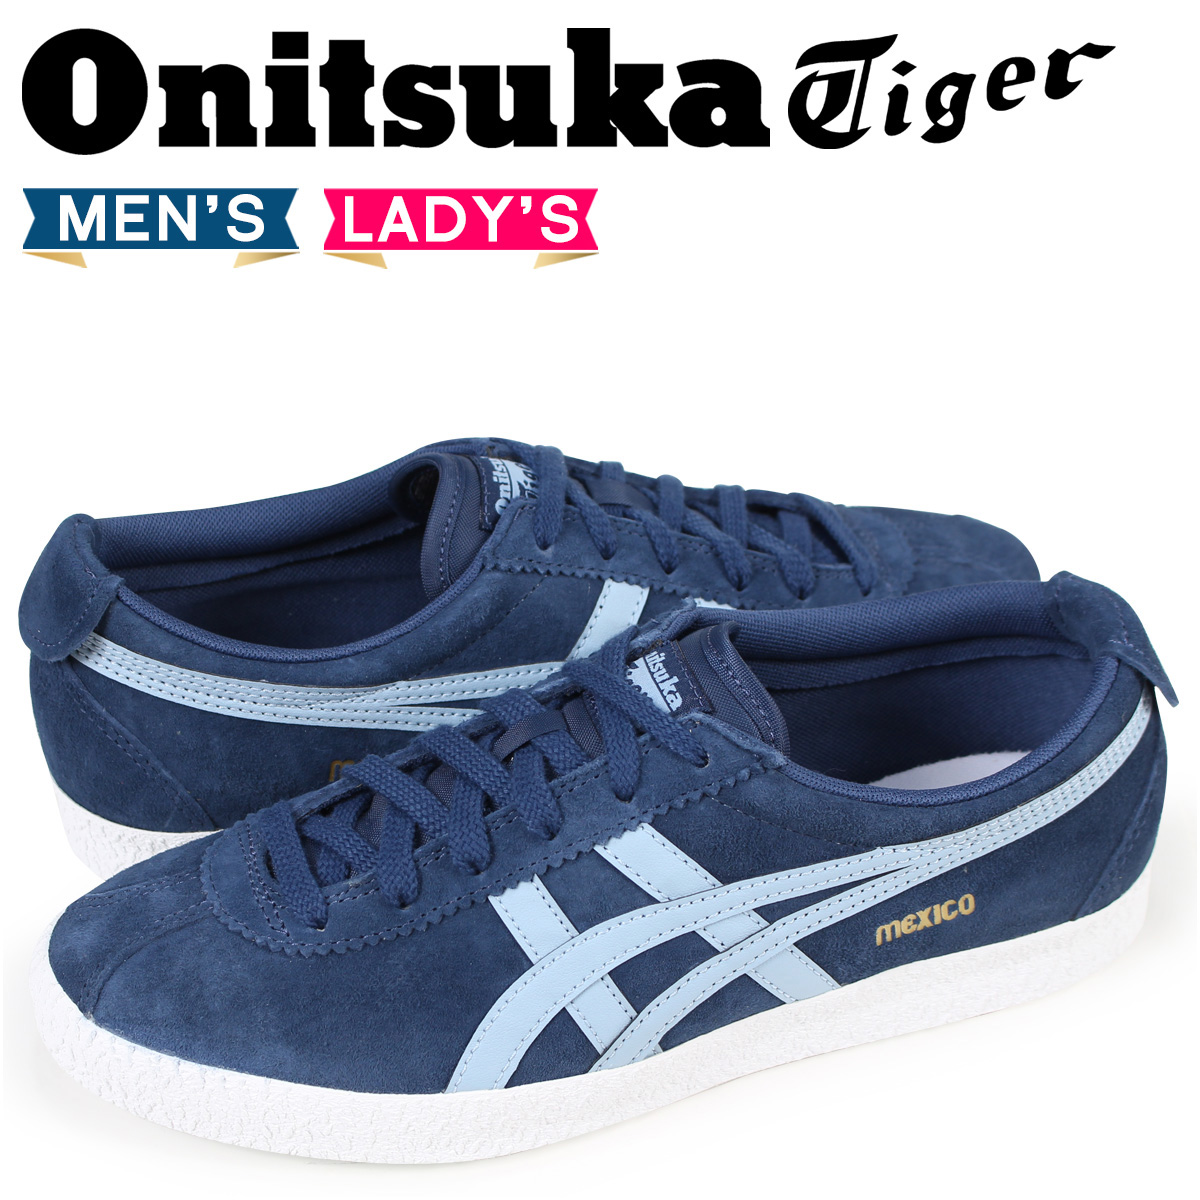 save off 9f1db 8604c Onitsuka tiger Onitsuka Tiger Mexico MEXICO DELEGATION men gap Dis sneakers  D6E7L-4944 blue